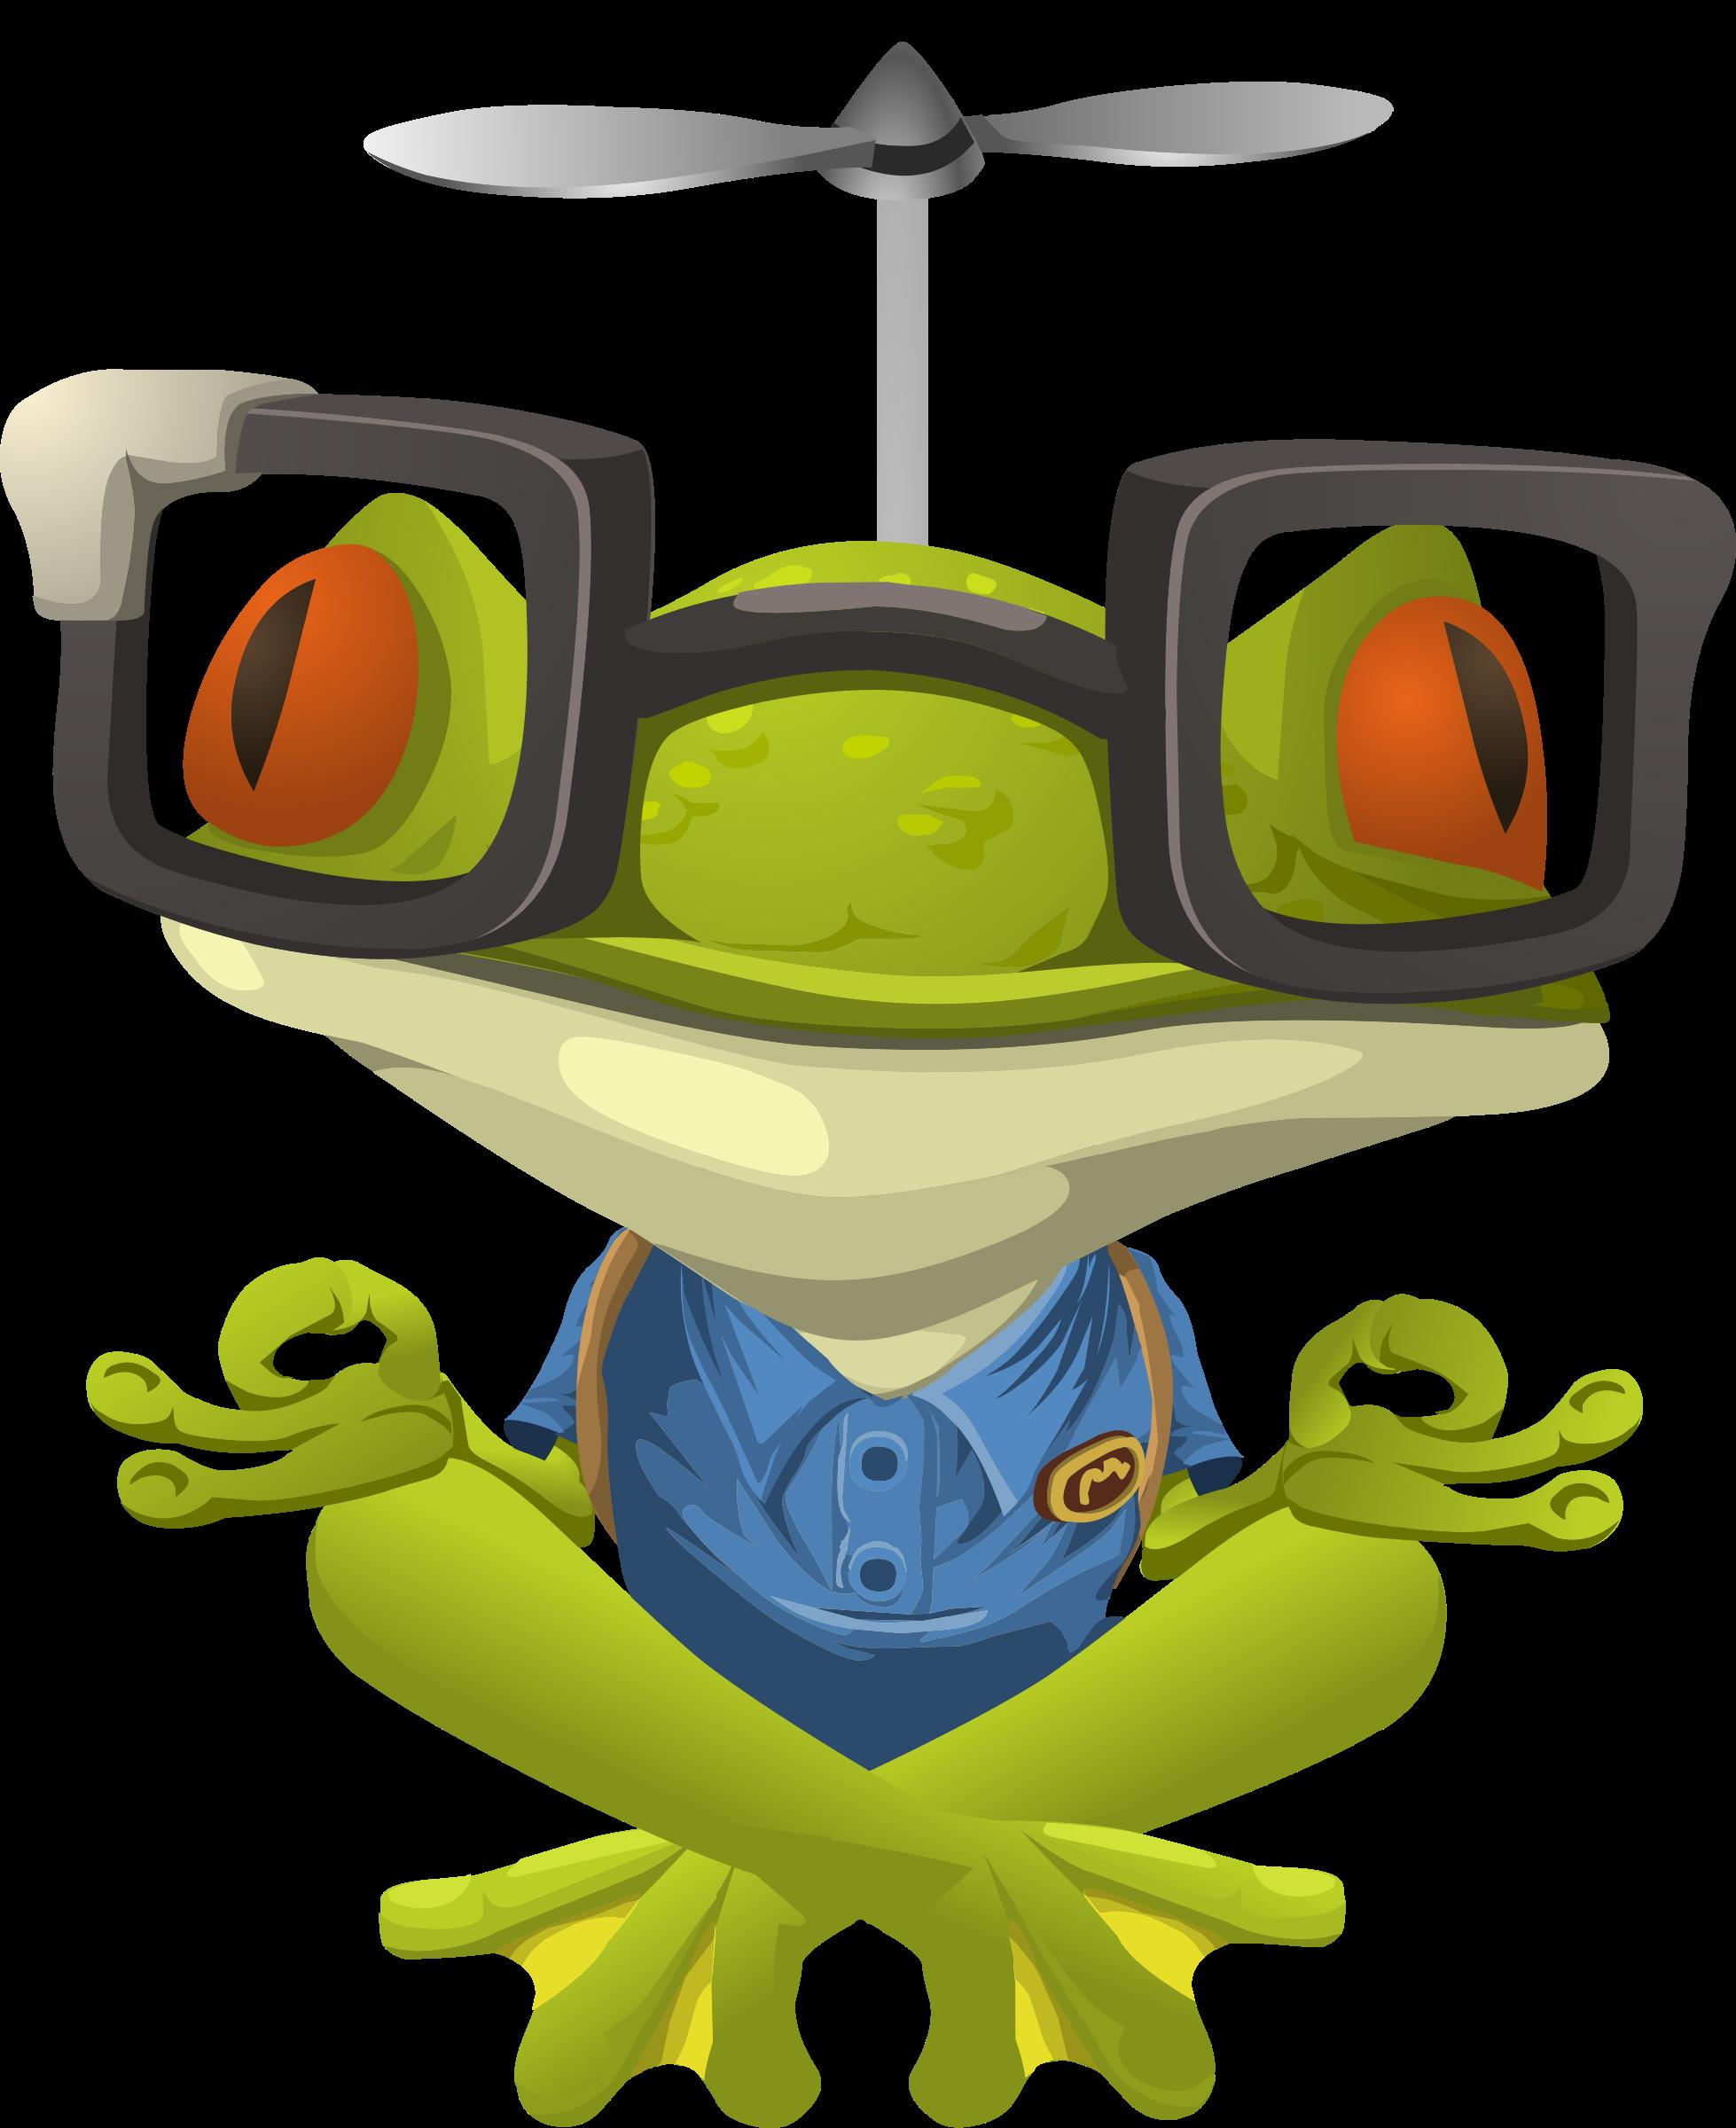 Glitch clipart frog Frog Myopic Frog Clipart Npc